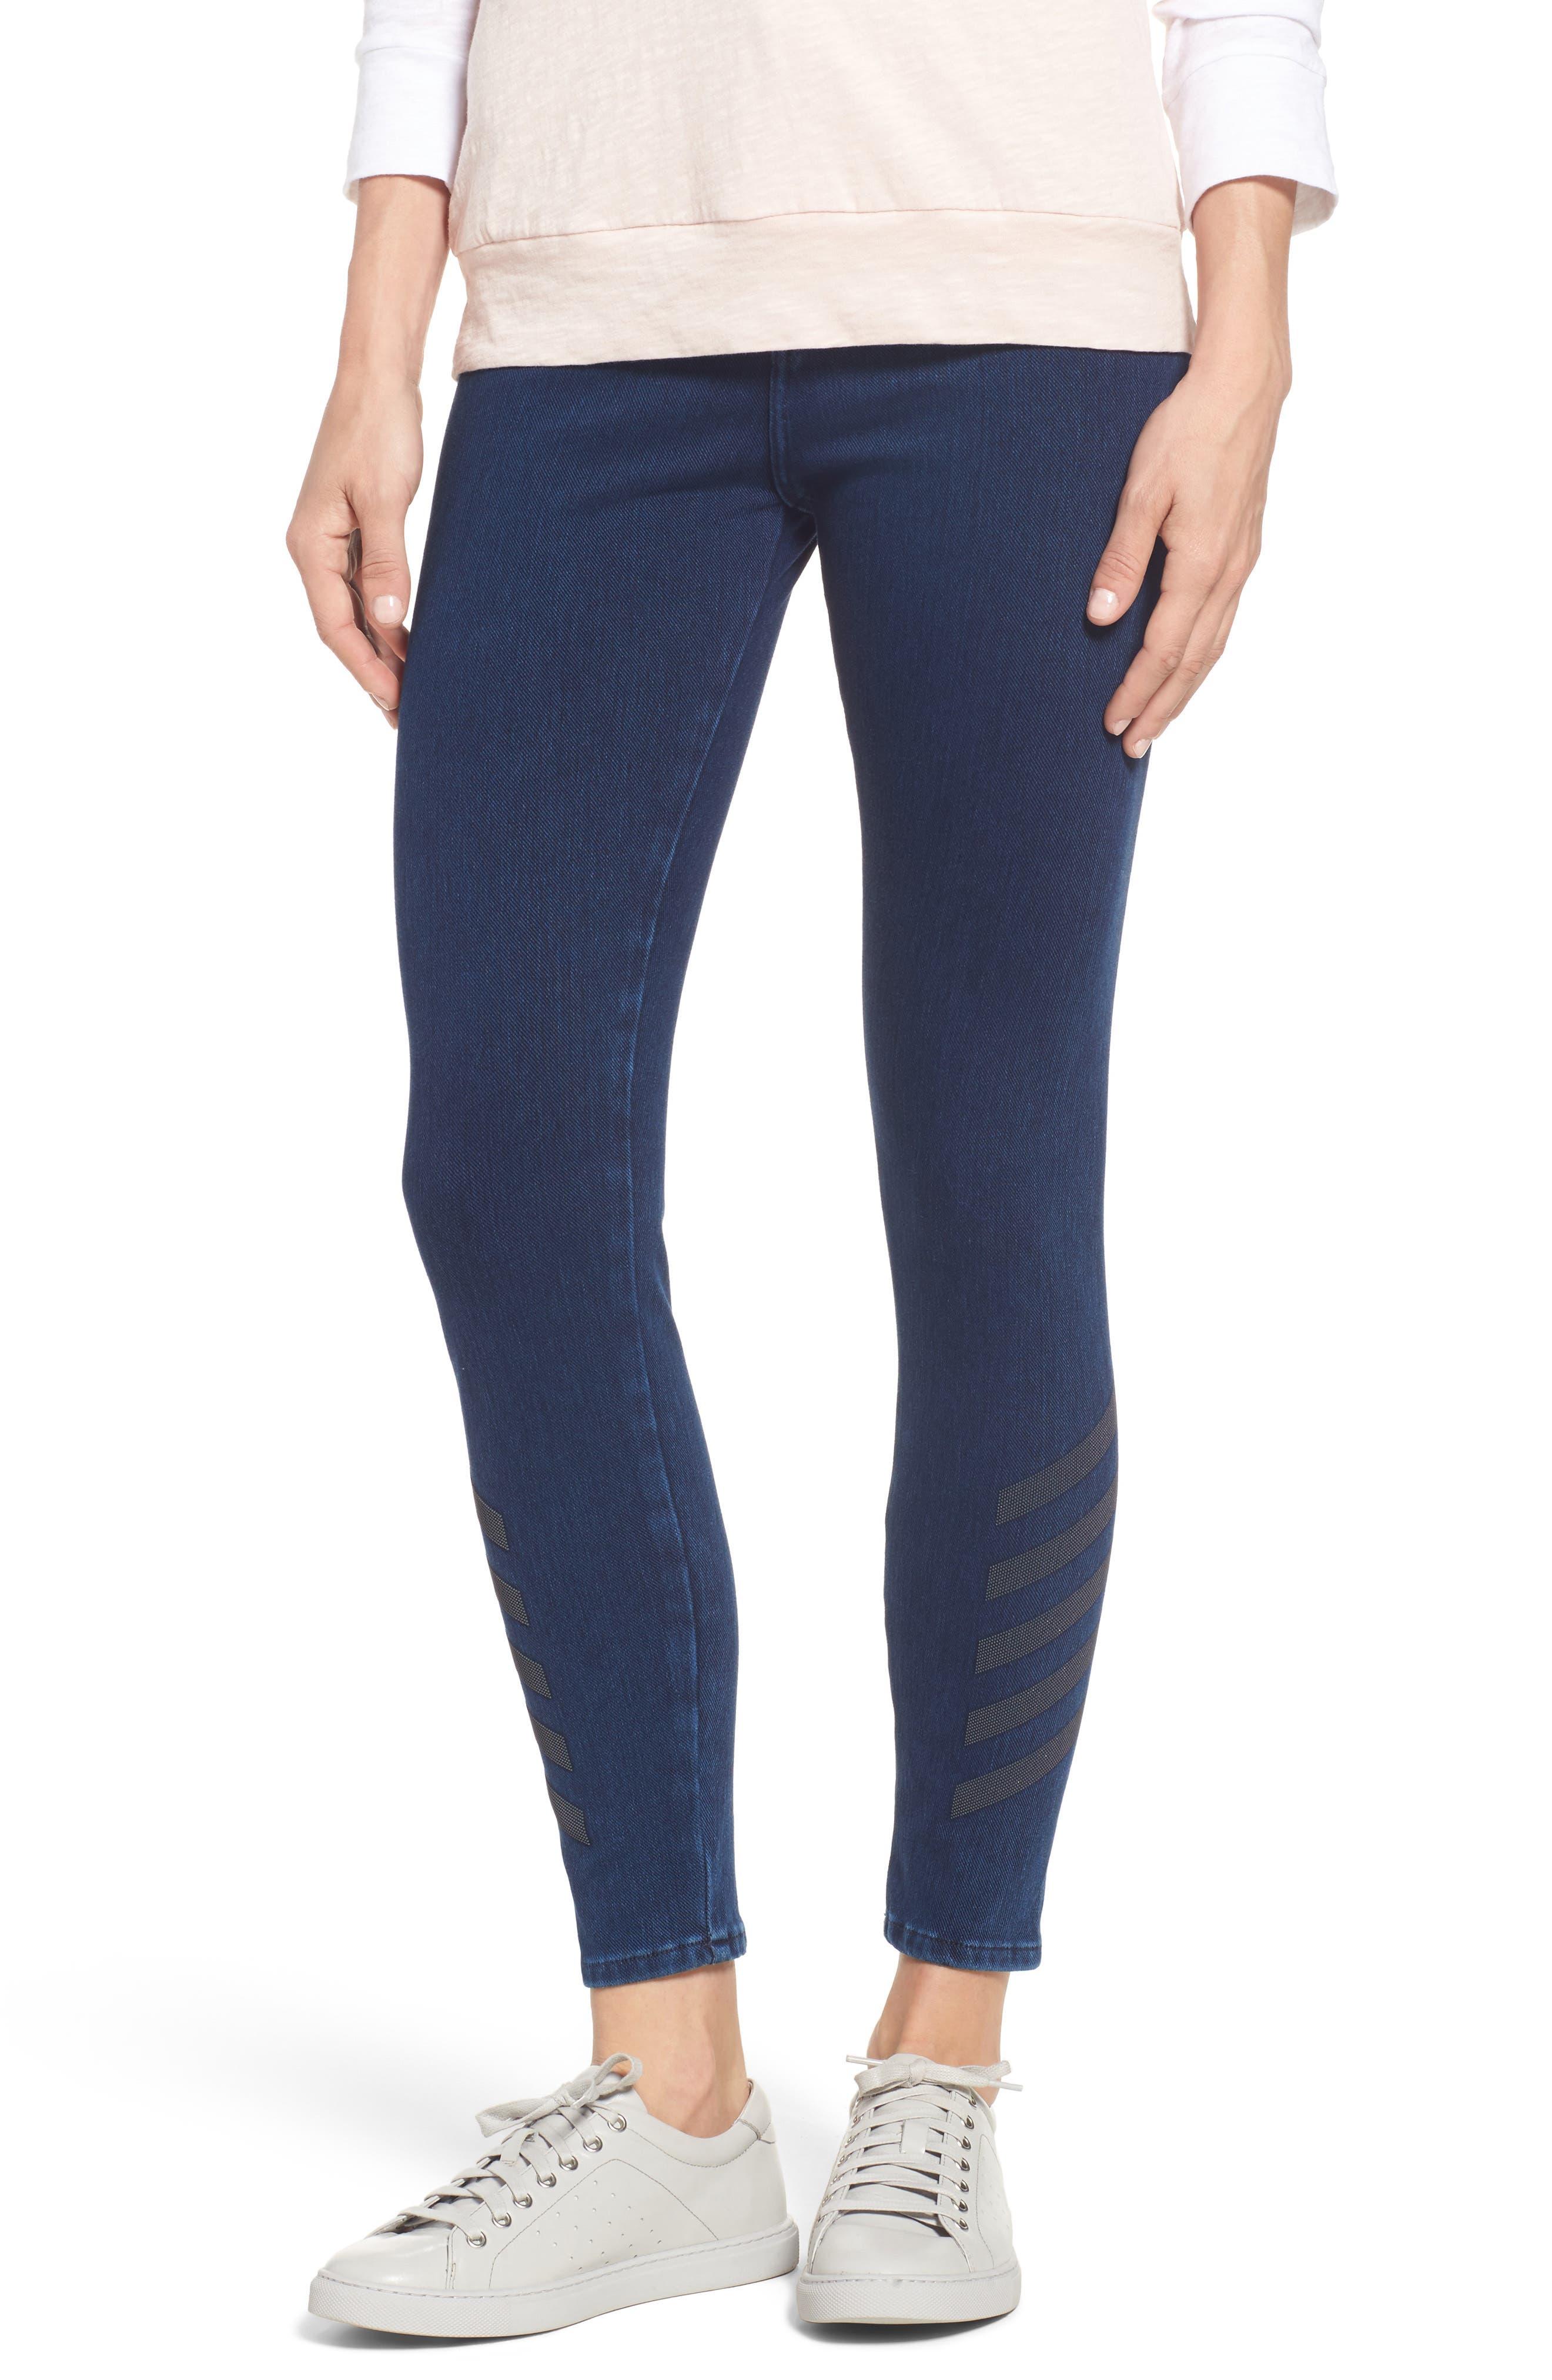 Joie Embellished High Waist Skinny Jeans,                         Main,                         color,